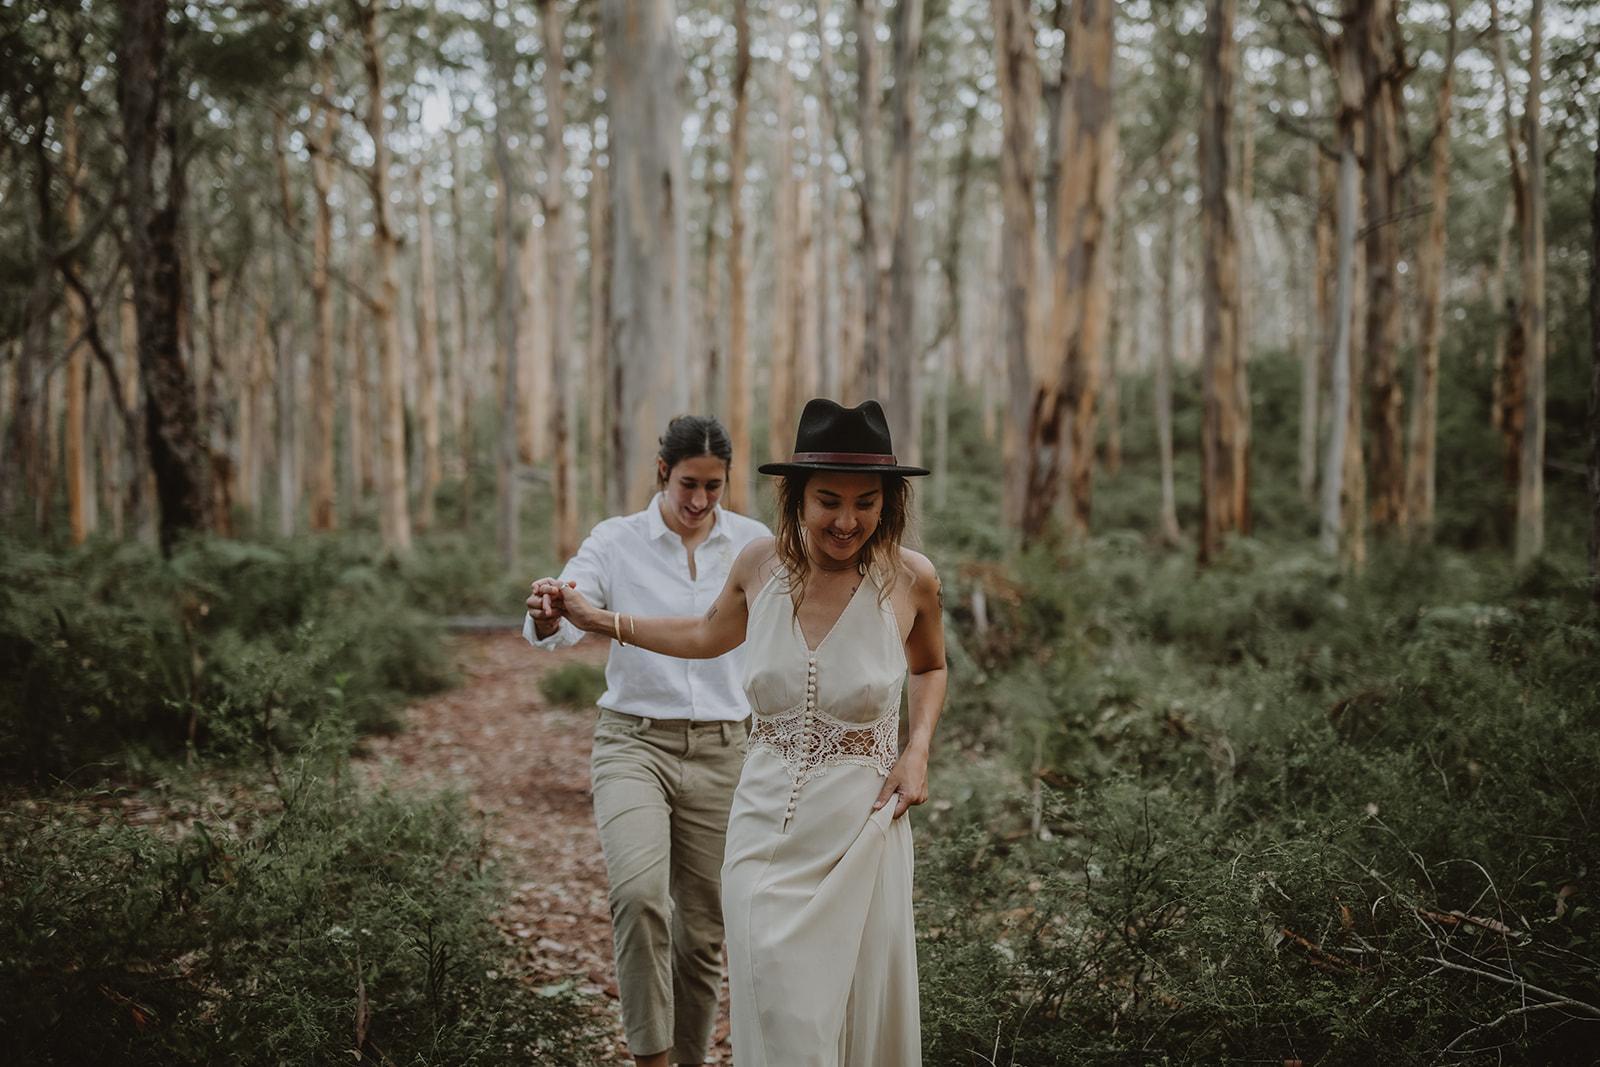 Emma Macaulay photography lesbian gay same-sex two brides forest bush elopement Margaret River Western Australia